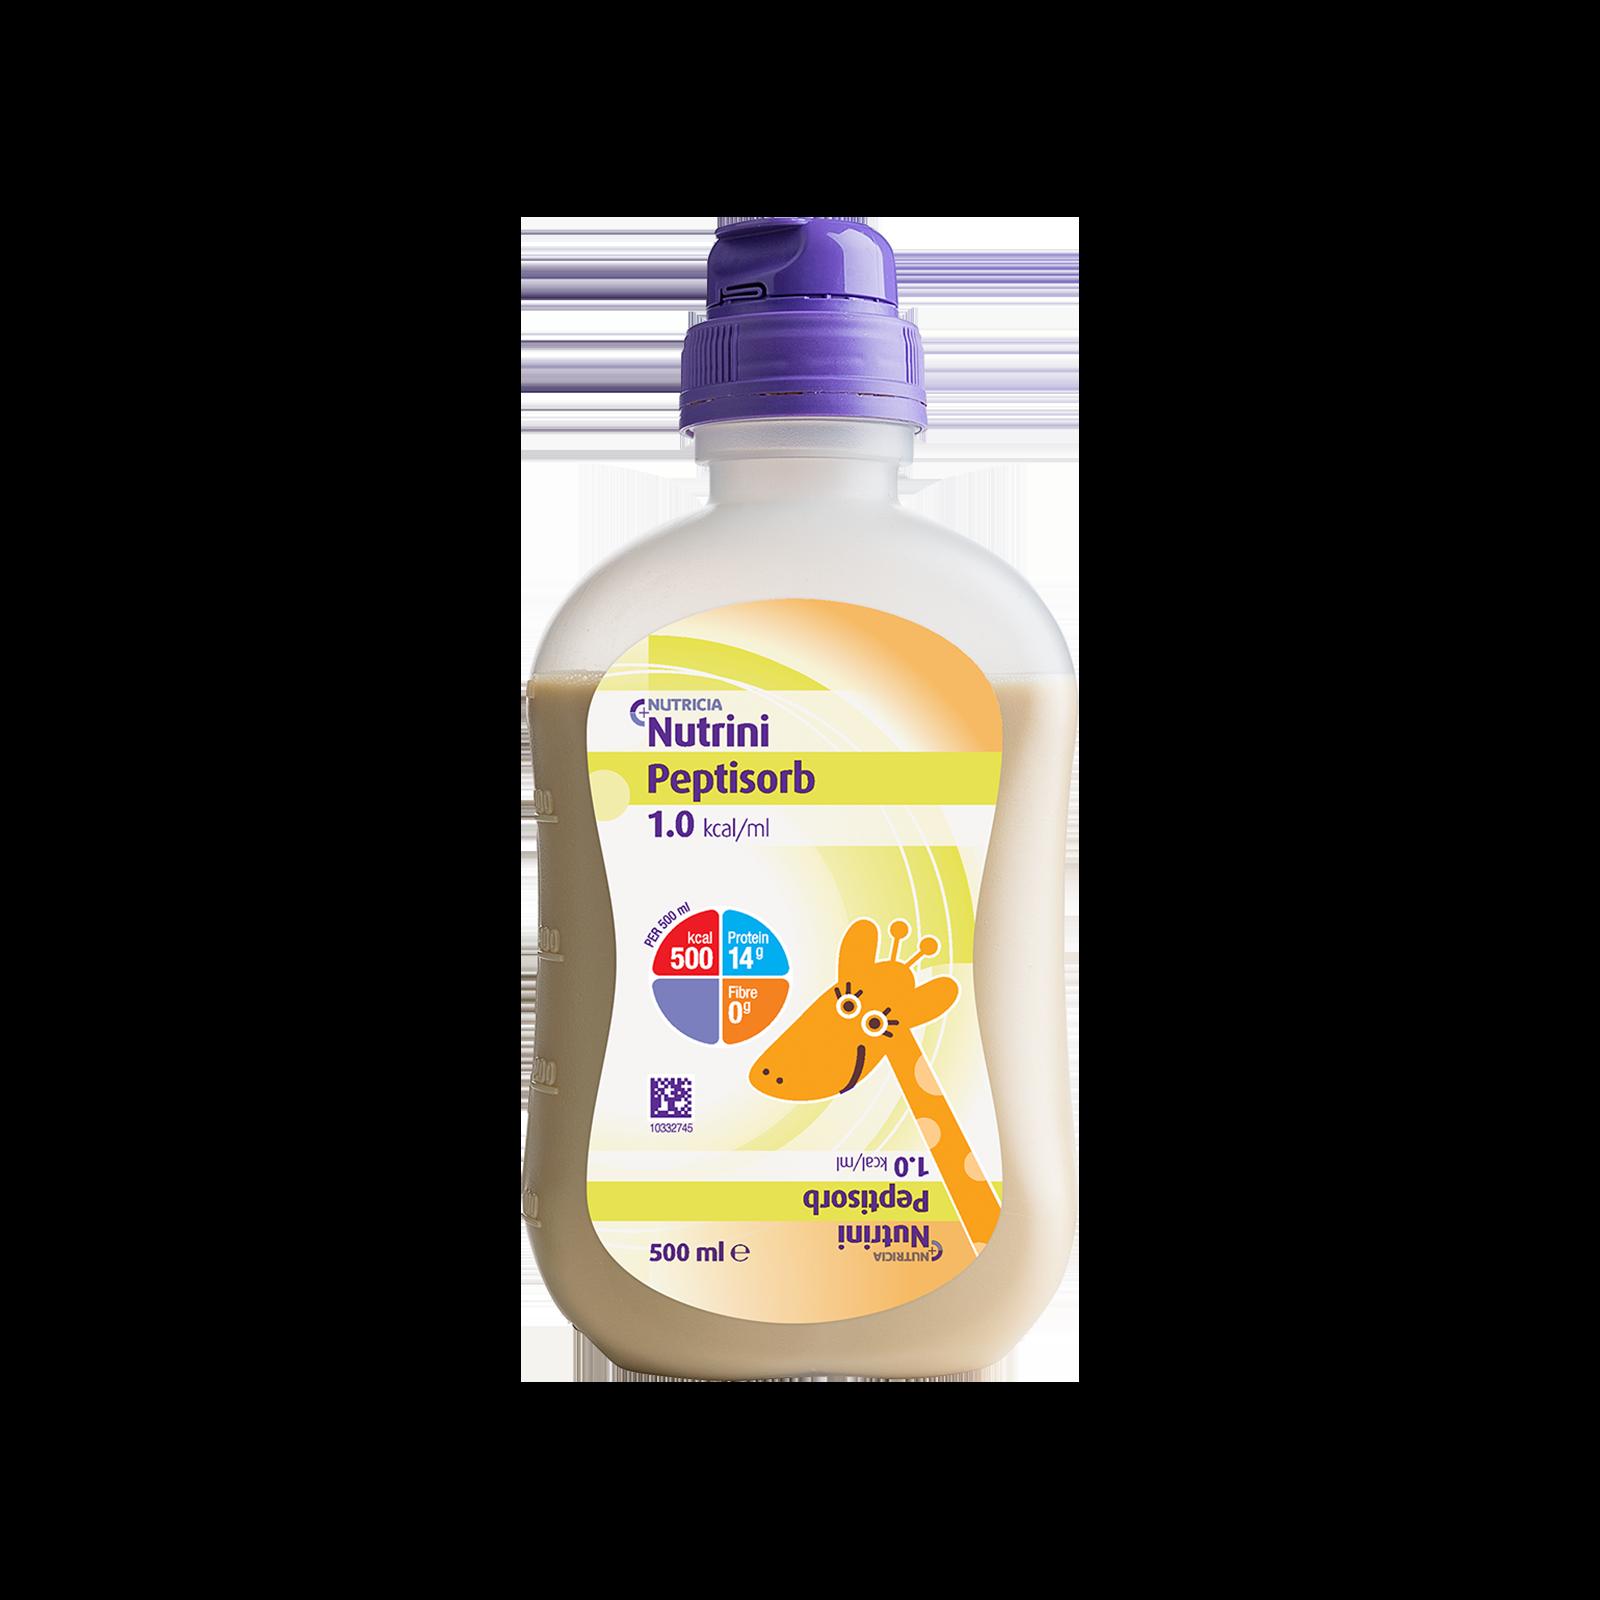 Nutrini Peptisorb Pack da 500 ml | Nutricia